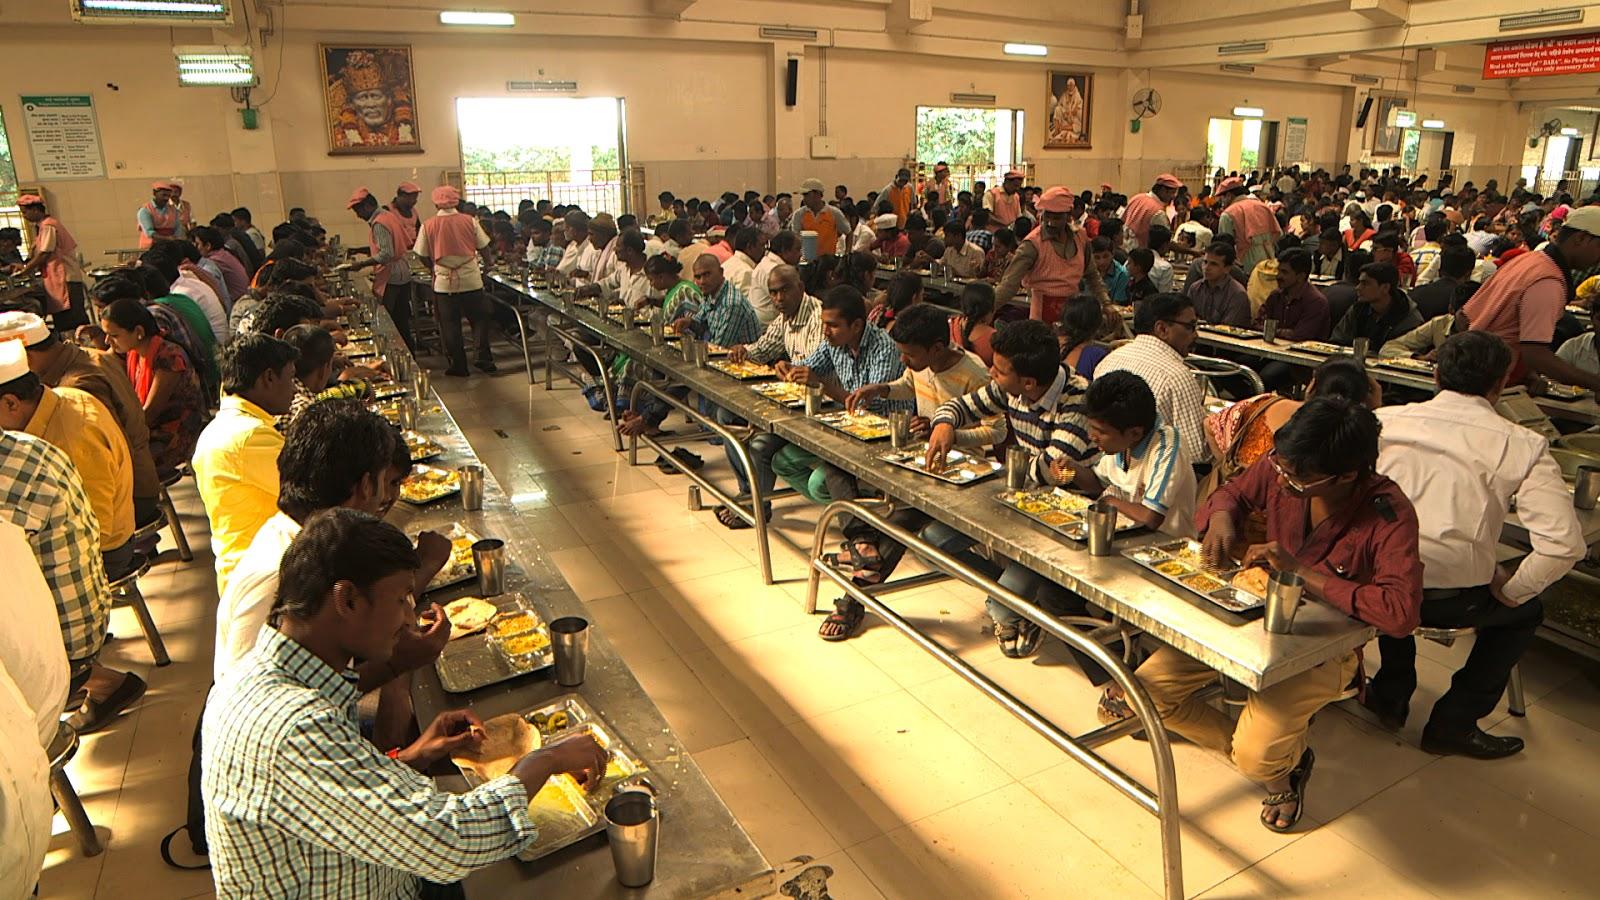 Solar, Solar Powered, Shirdi Prasadalaya, Sai Baba's Legacy, Solar Powered Kitchen, Solar Kitchen Shirdi, Solar Cooking System, Shirdi Prasadalaya Solar, Shirdi Prasadam, India's Biggest Kitchen